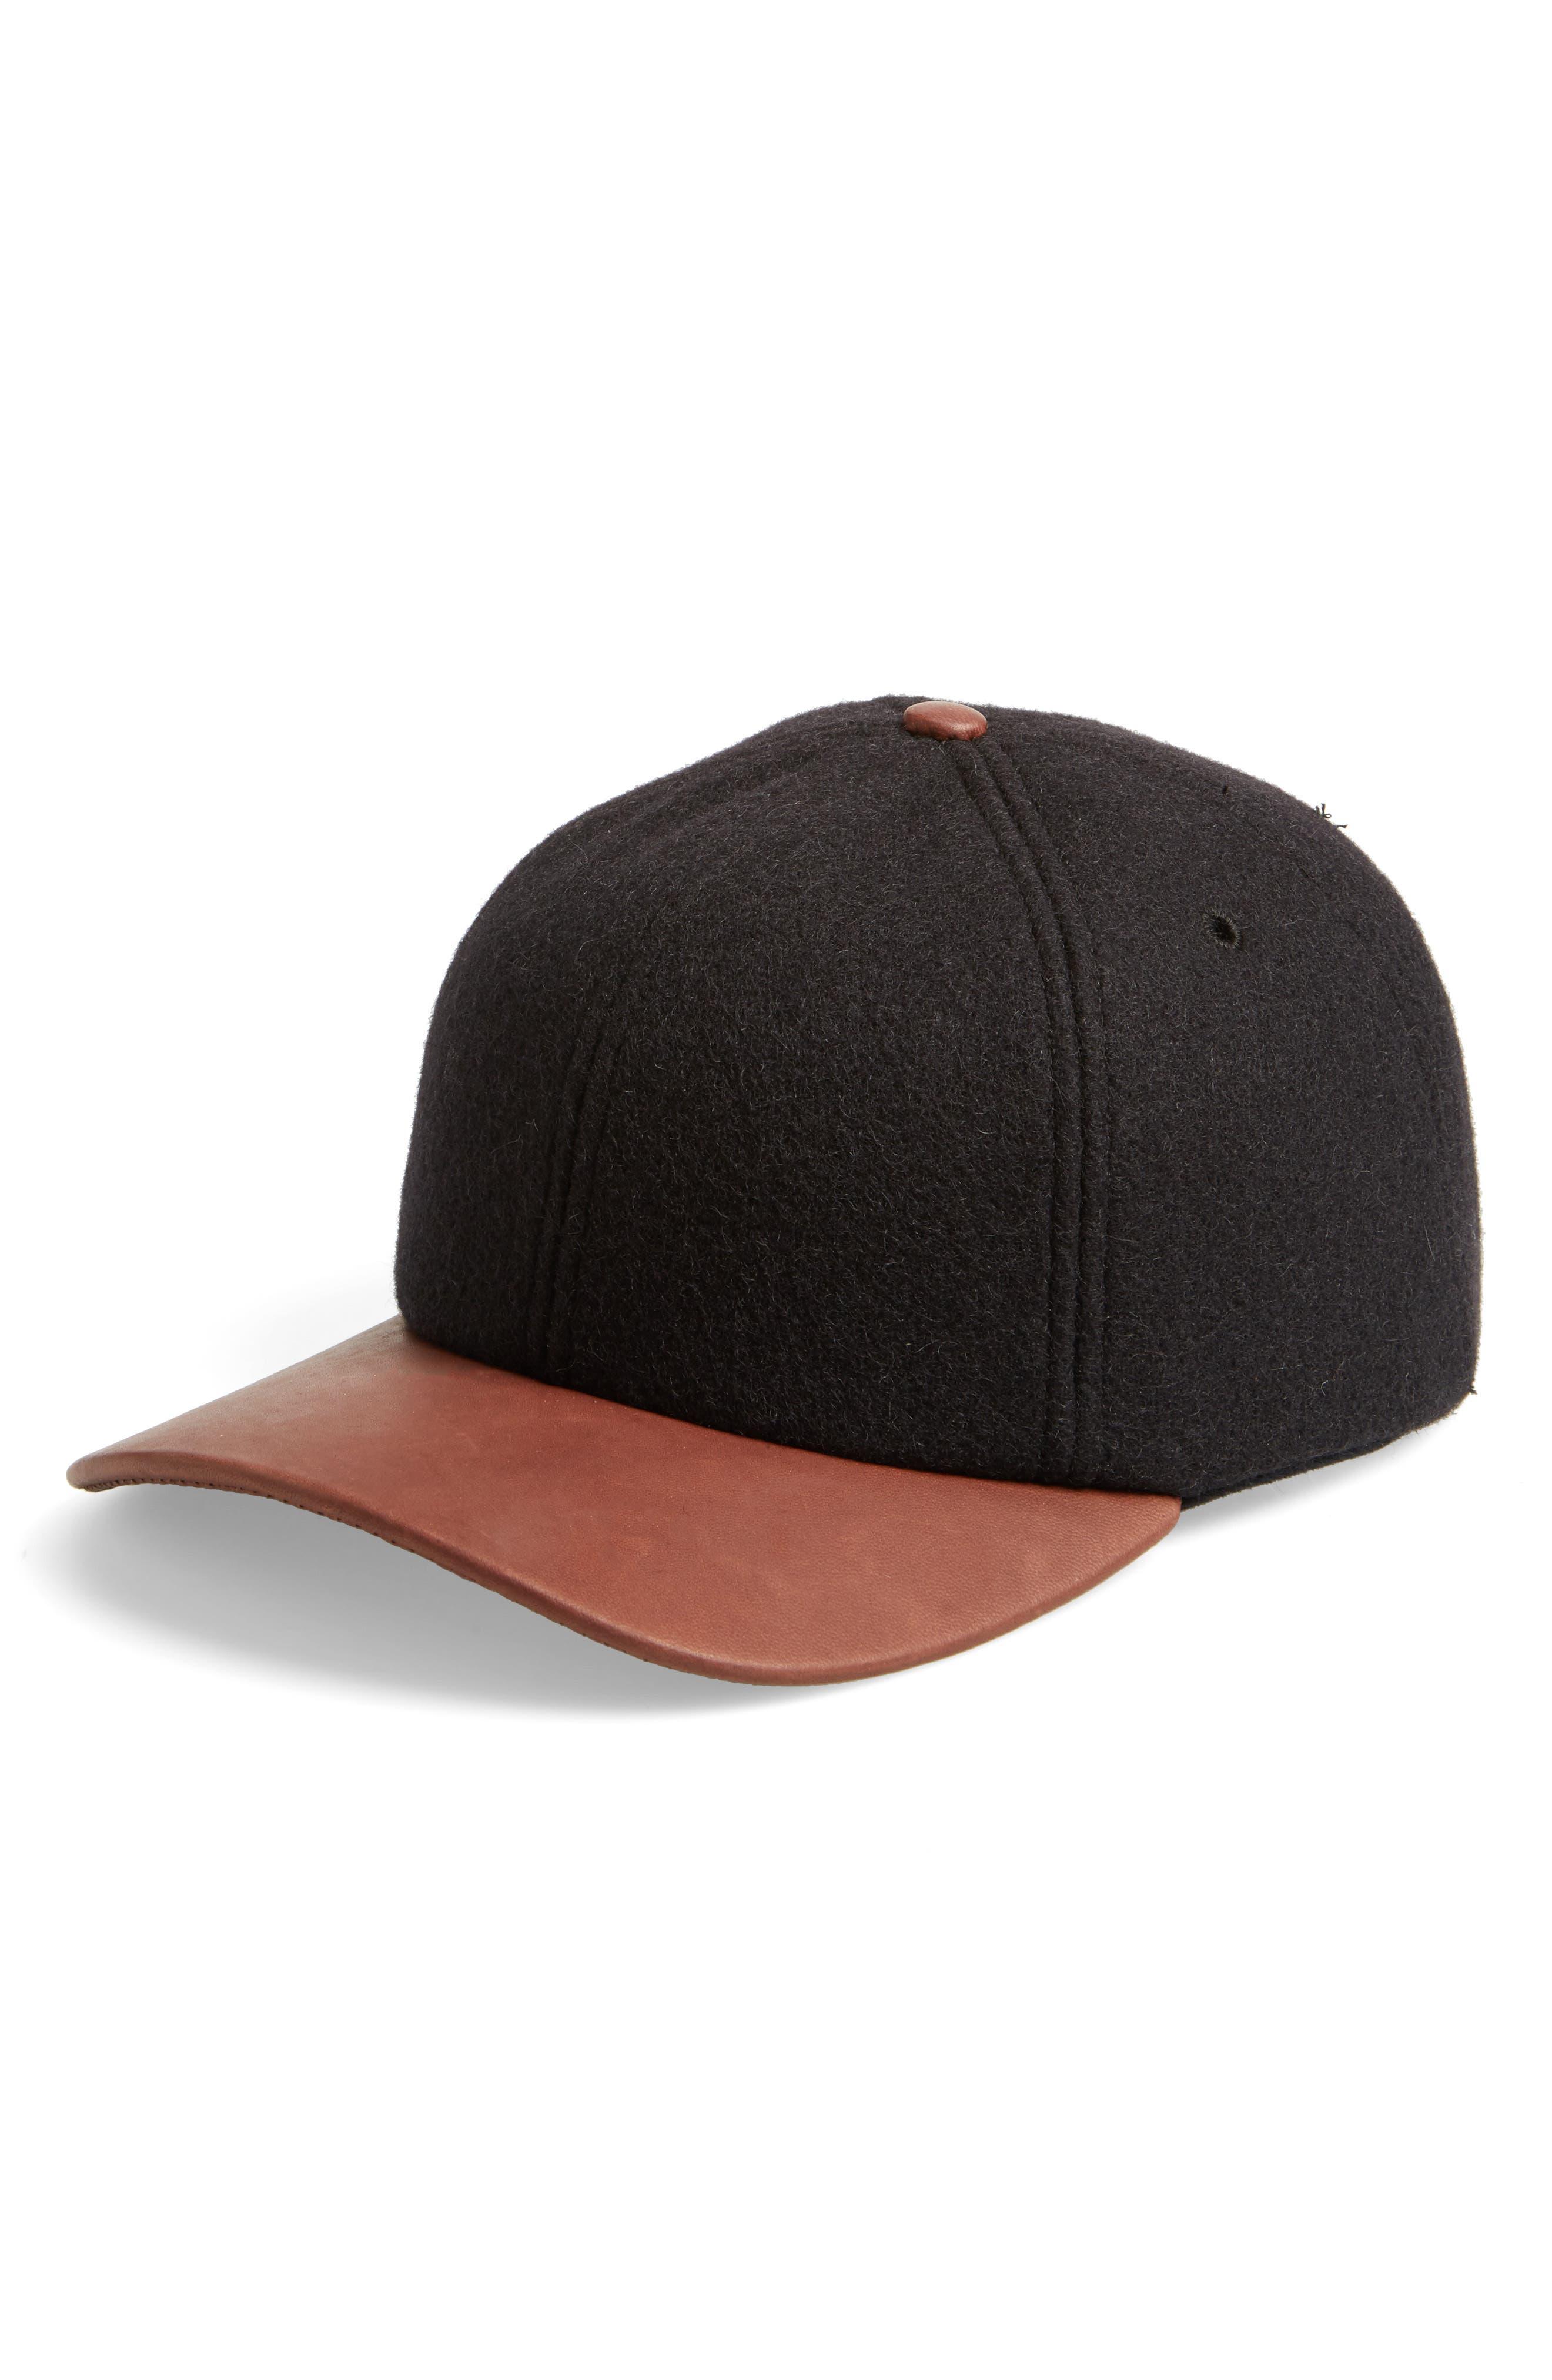 Melton Wool Blend Baseball Cap,                             Main thumbnail 1, color,                             Black